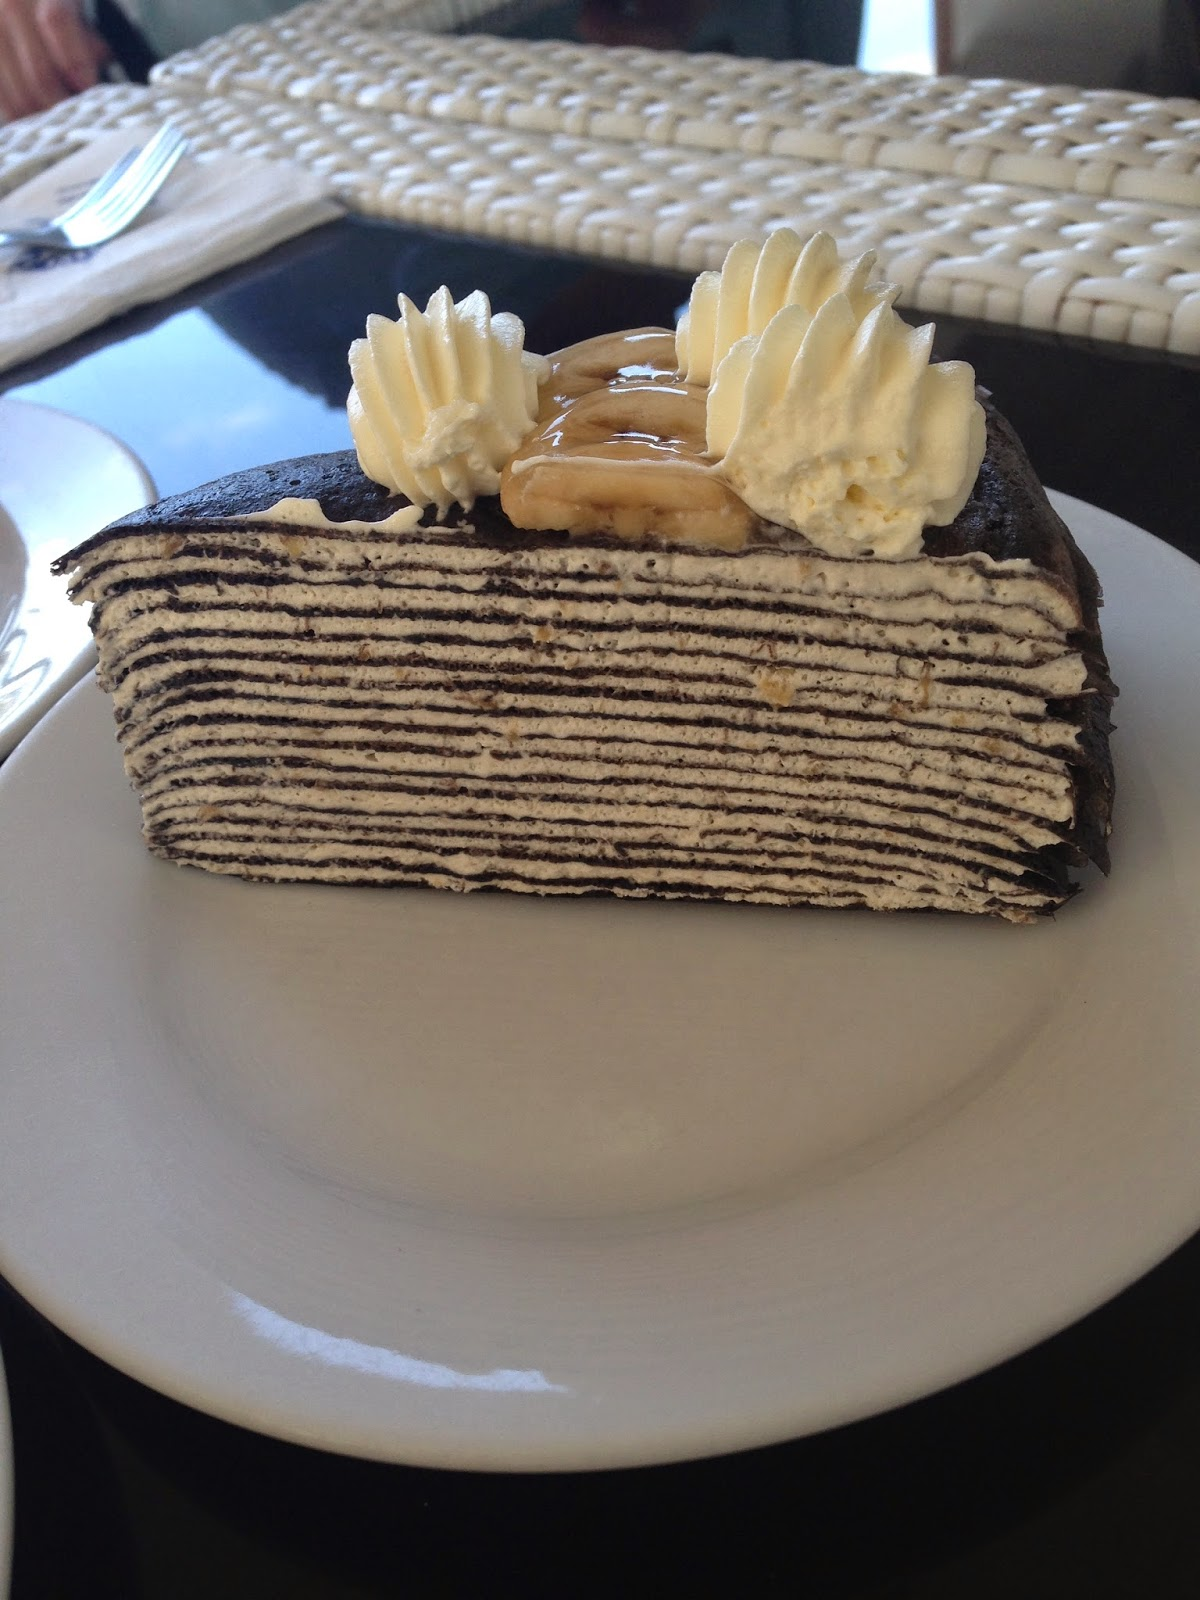 Mille Crepe, Banana Chocolate, Nadeje at Plaza Mahkota, @www.lifefoodcoffee.com